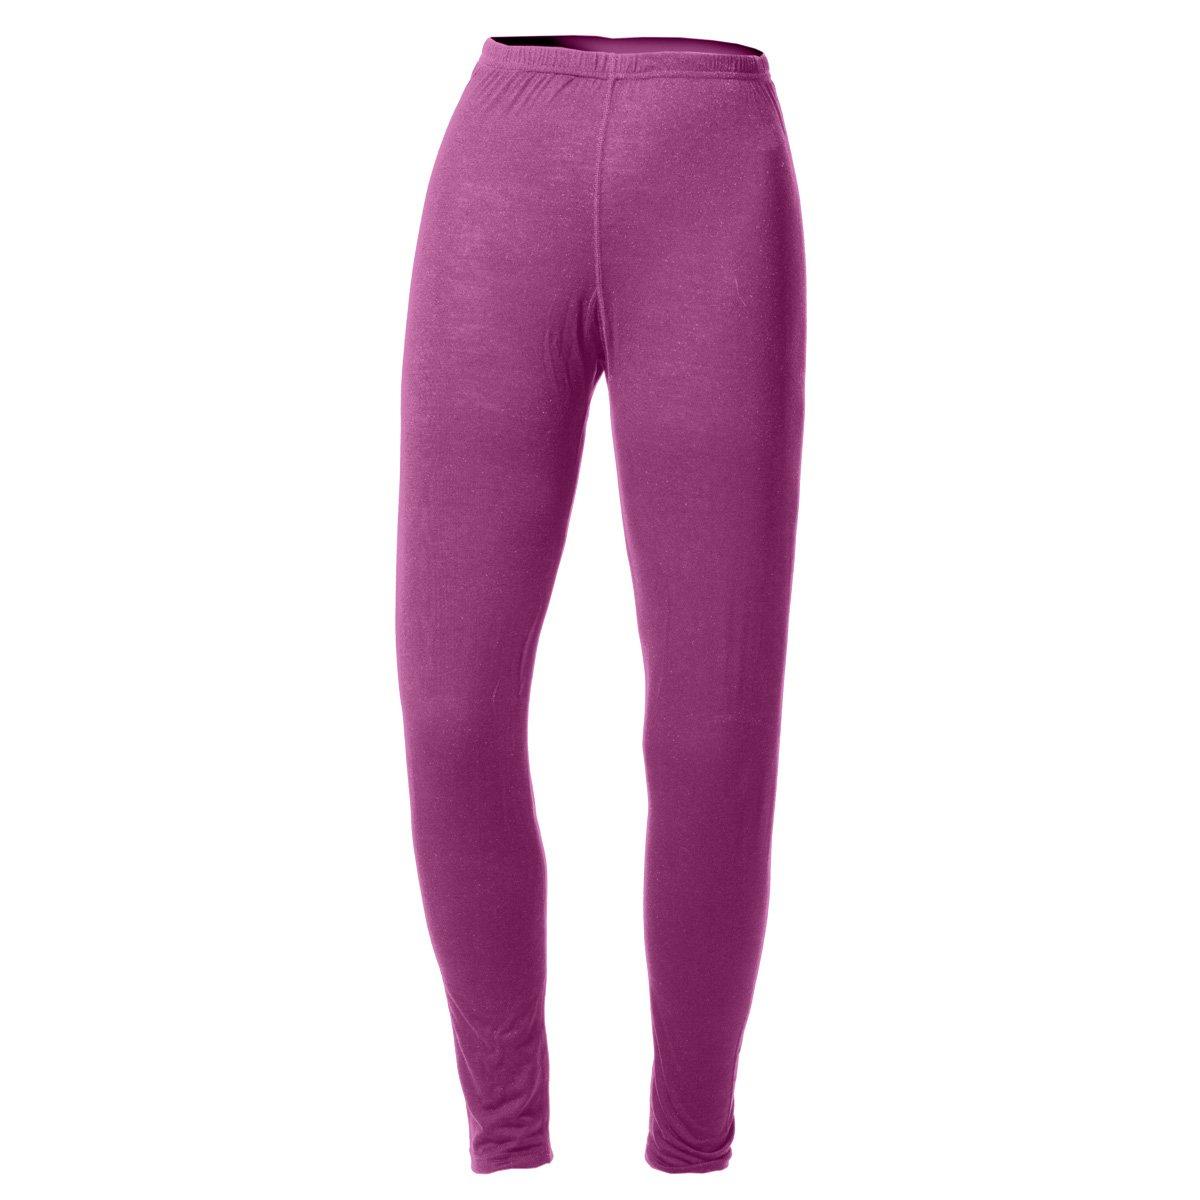 Minus33 Merino Wool Clothing 803 Women's Franconia Midweight Wool Bottom, Radiant Violet, Medium by Minus33 Merino Wool (Image #4)